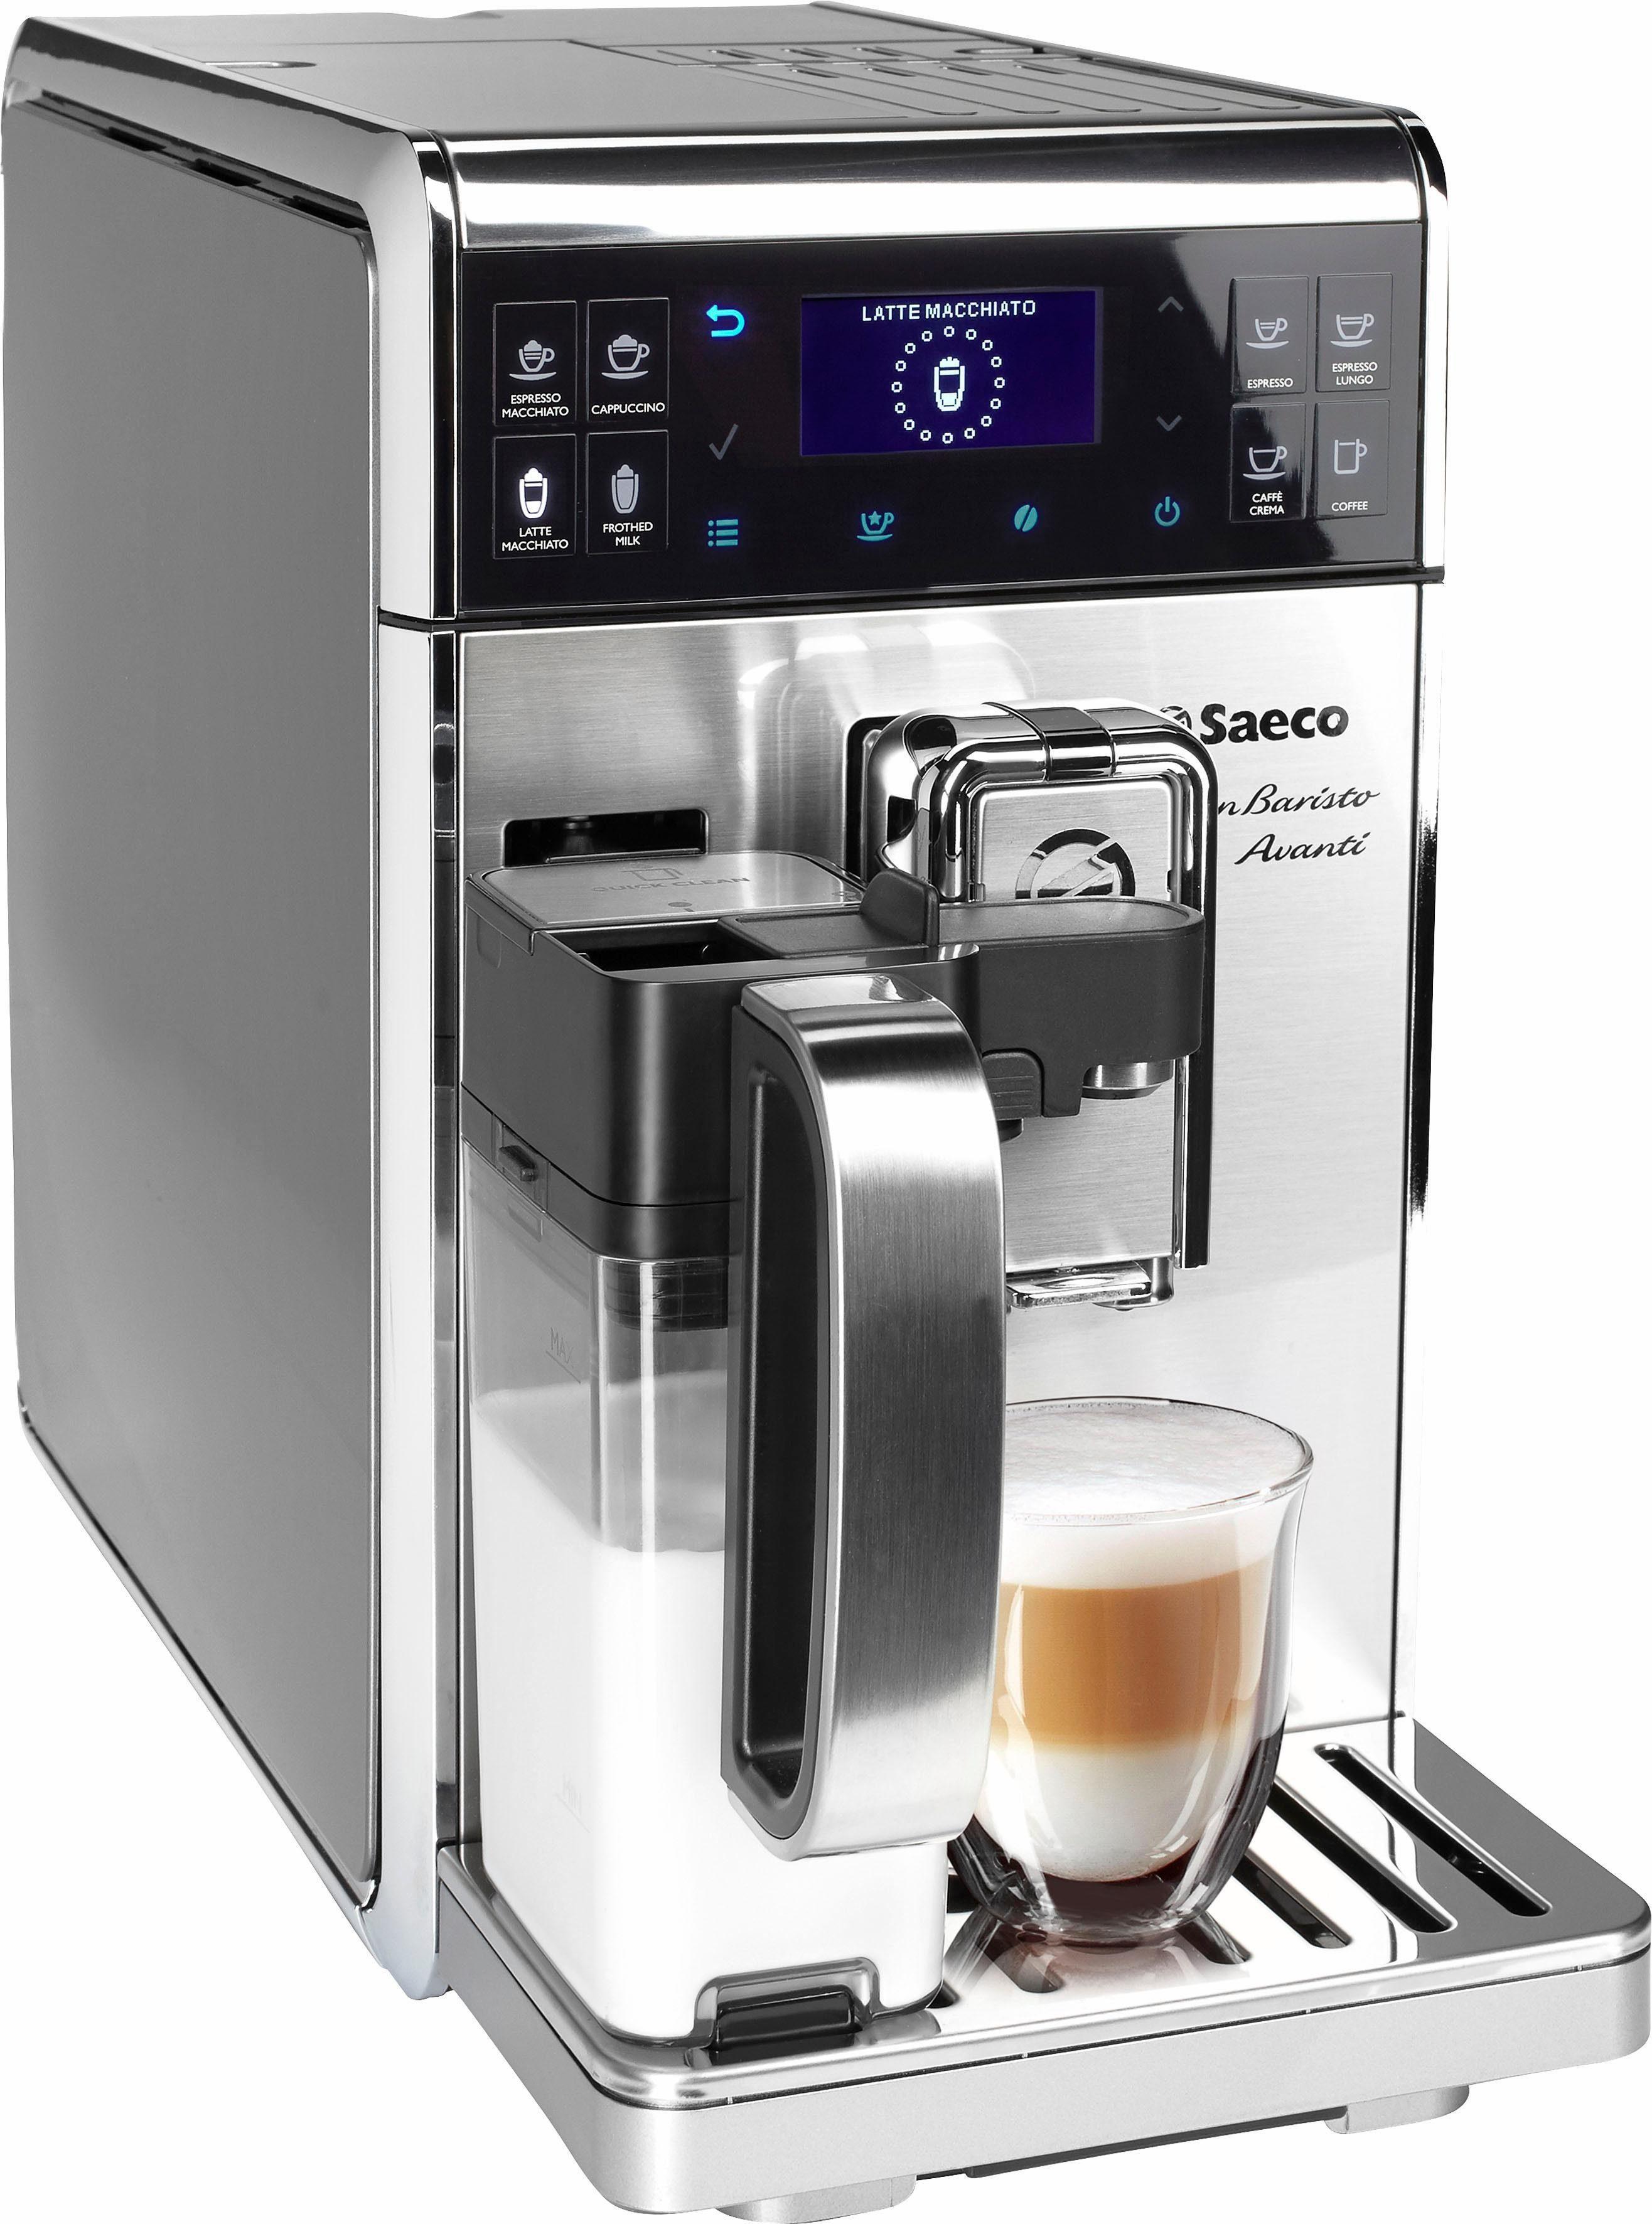 Saeco Kaffeevollautomat HD8977/01 Saeco GranBaristo Avanti mit AquaClean und App-Steuerung